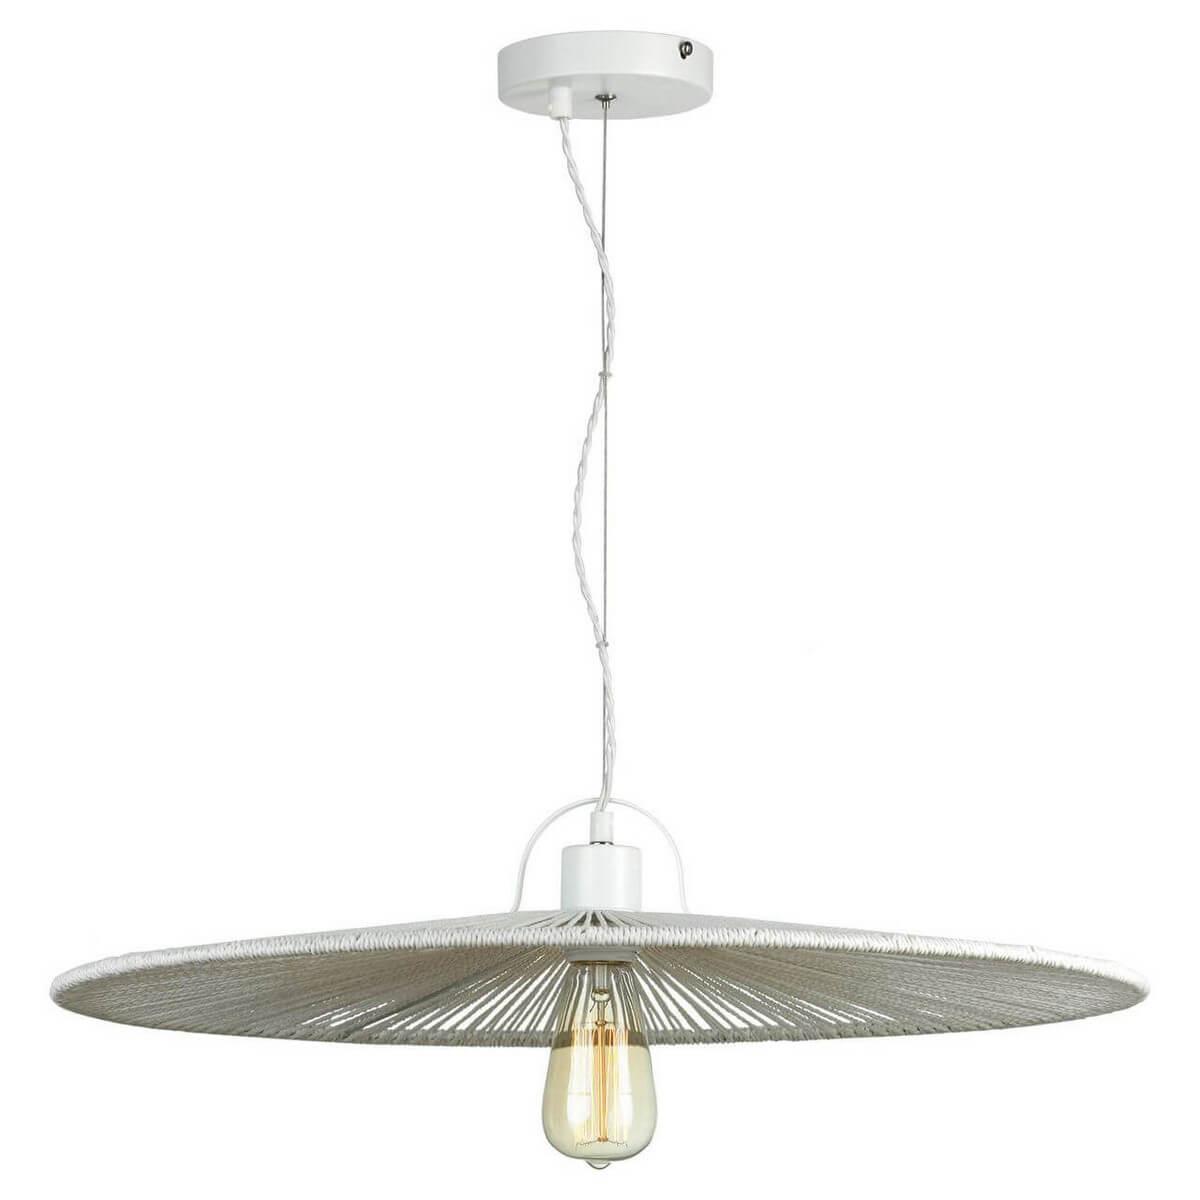 цена на Светильник Lussole LOFT LSP-9849 LSP-9849